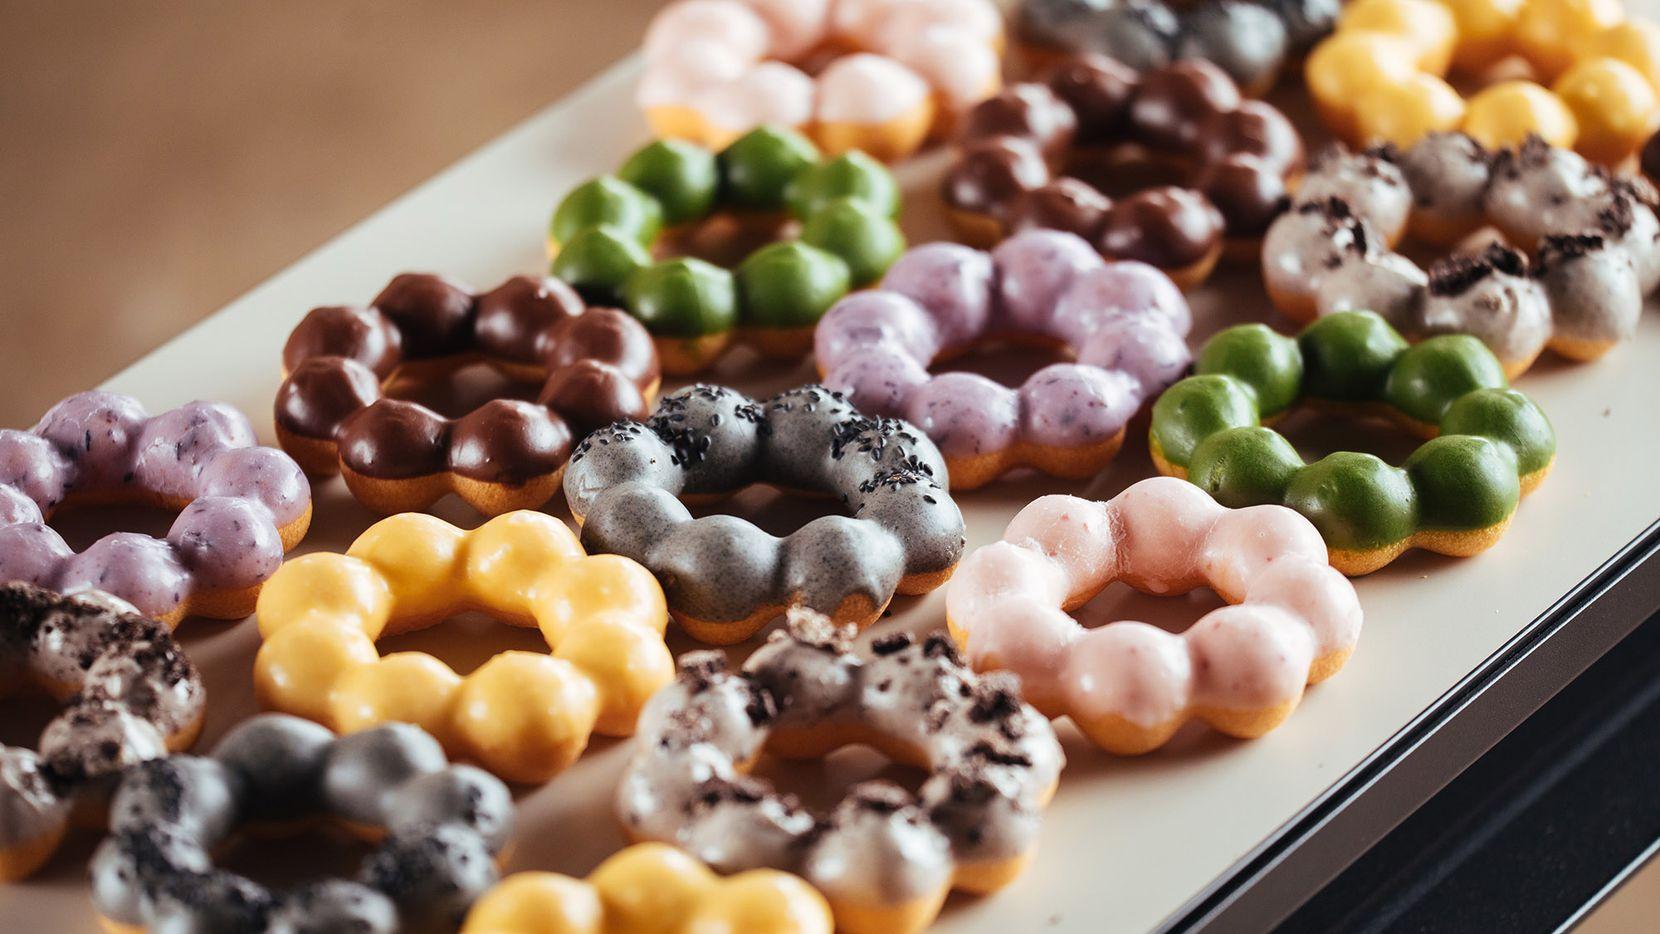 What's a mochi doughnut? Fat Straws Bubble Tea shop is